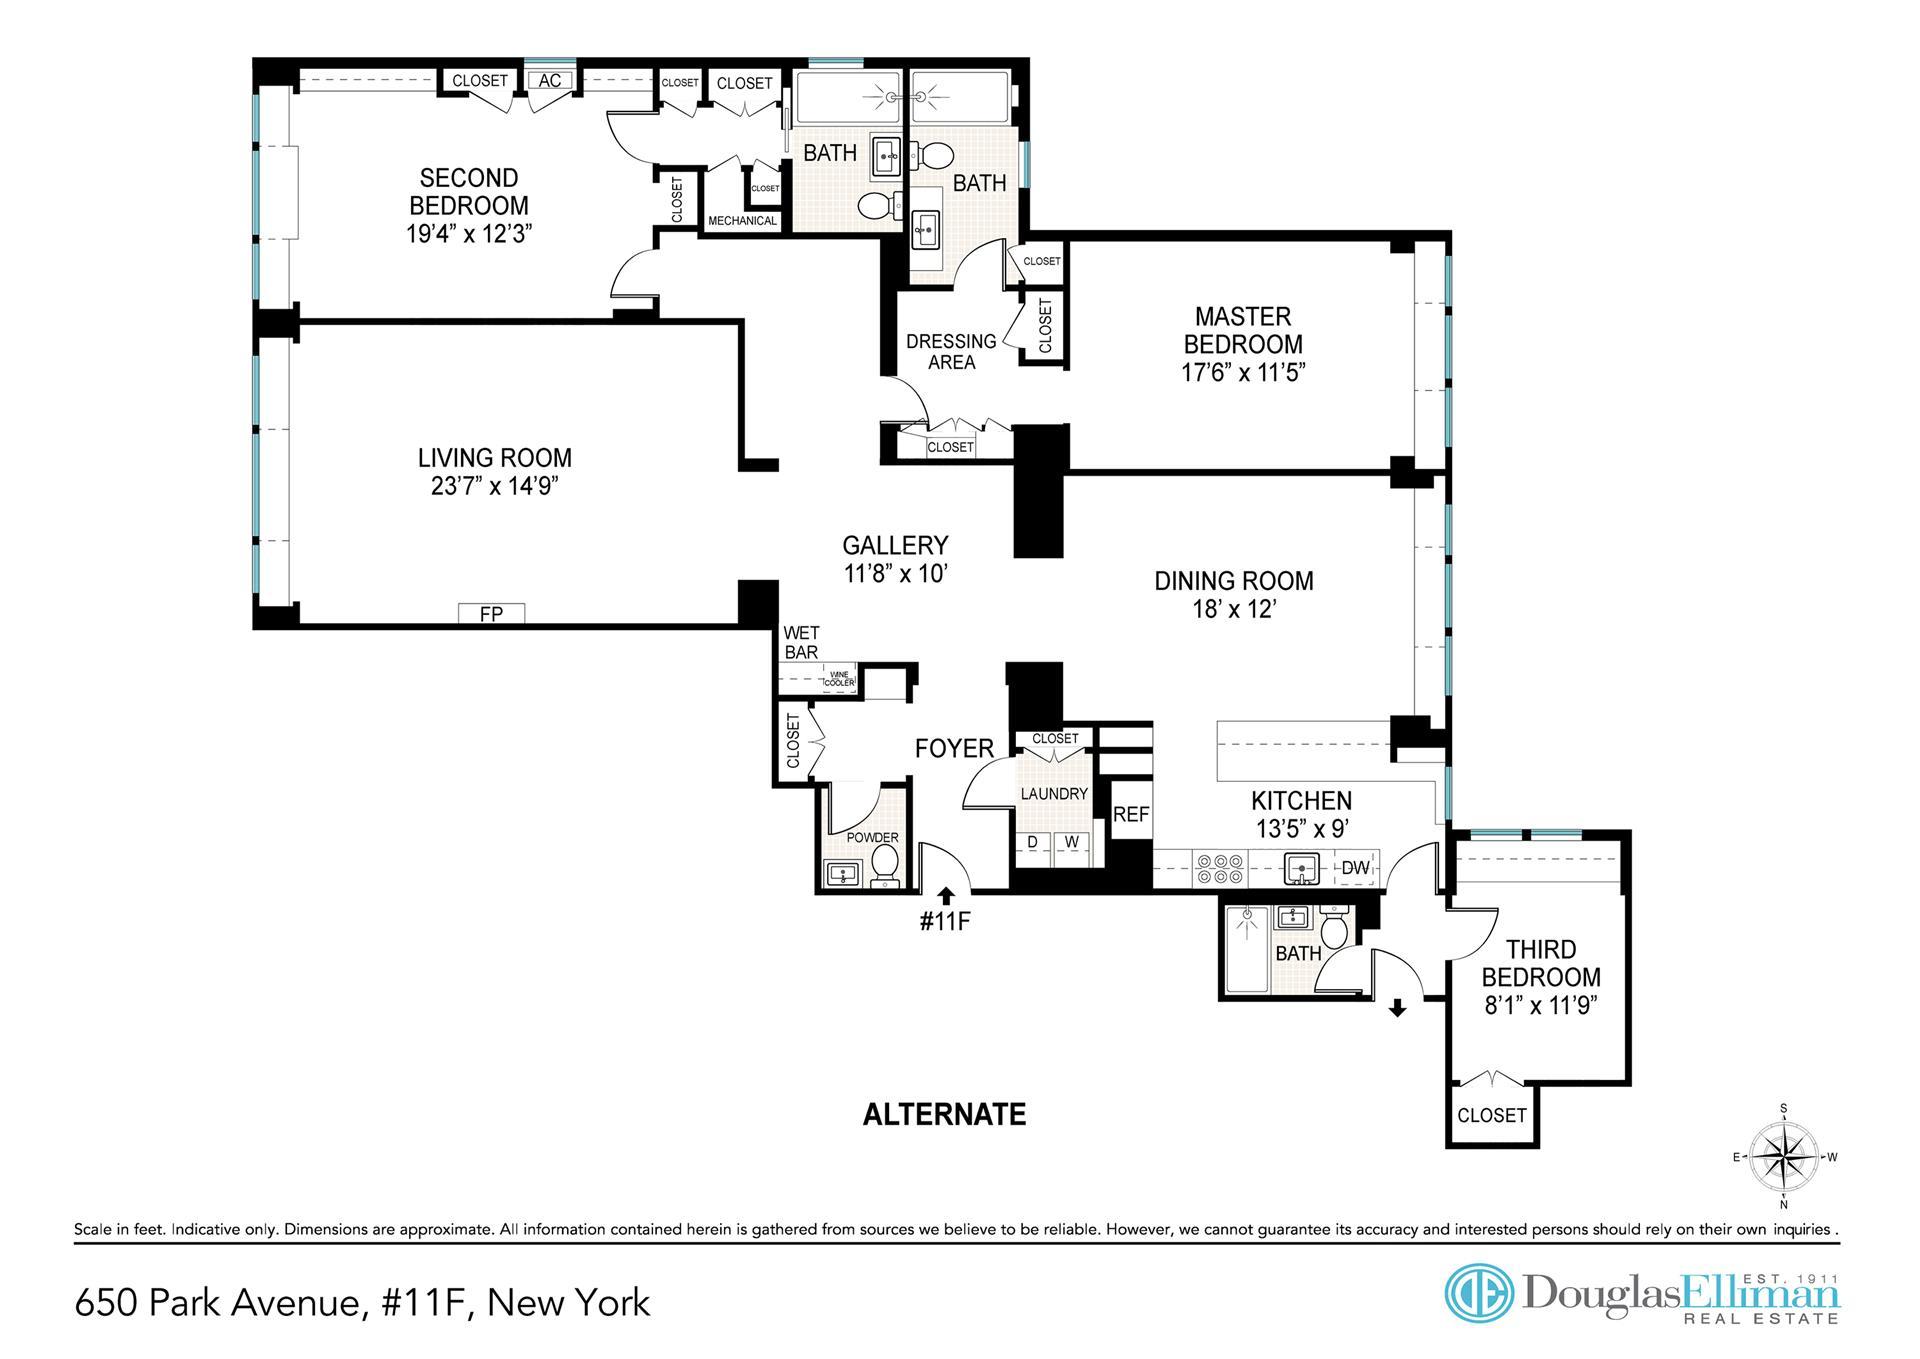 Floor plan of 650 Park Avenue, 11F - Upper East Side, New York